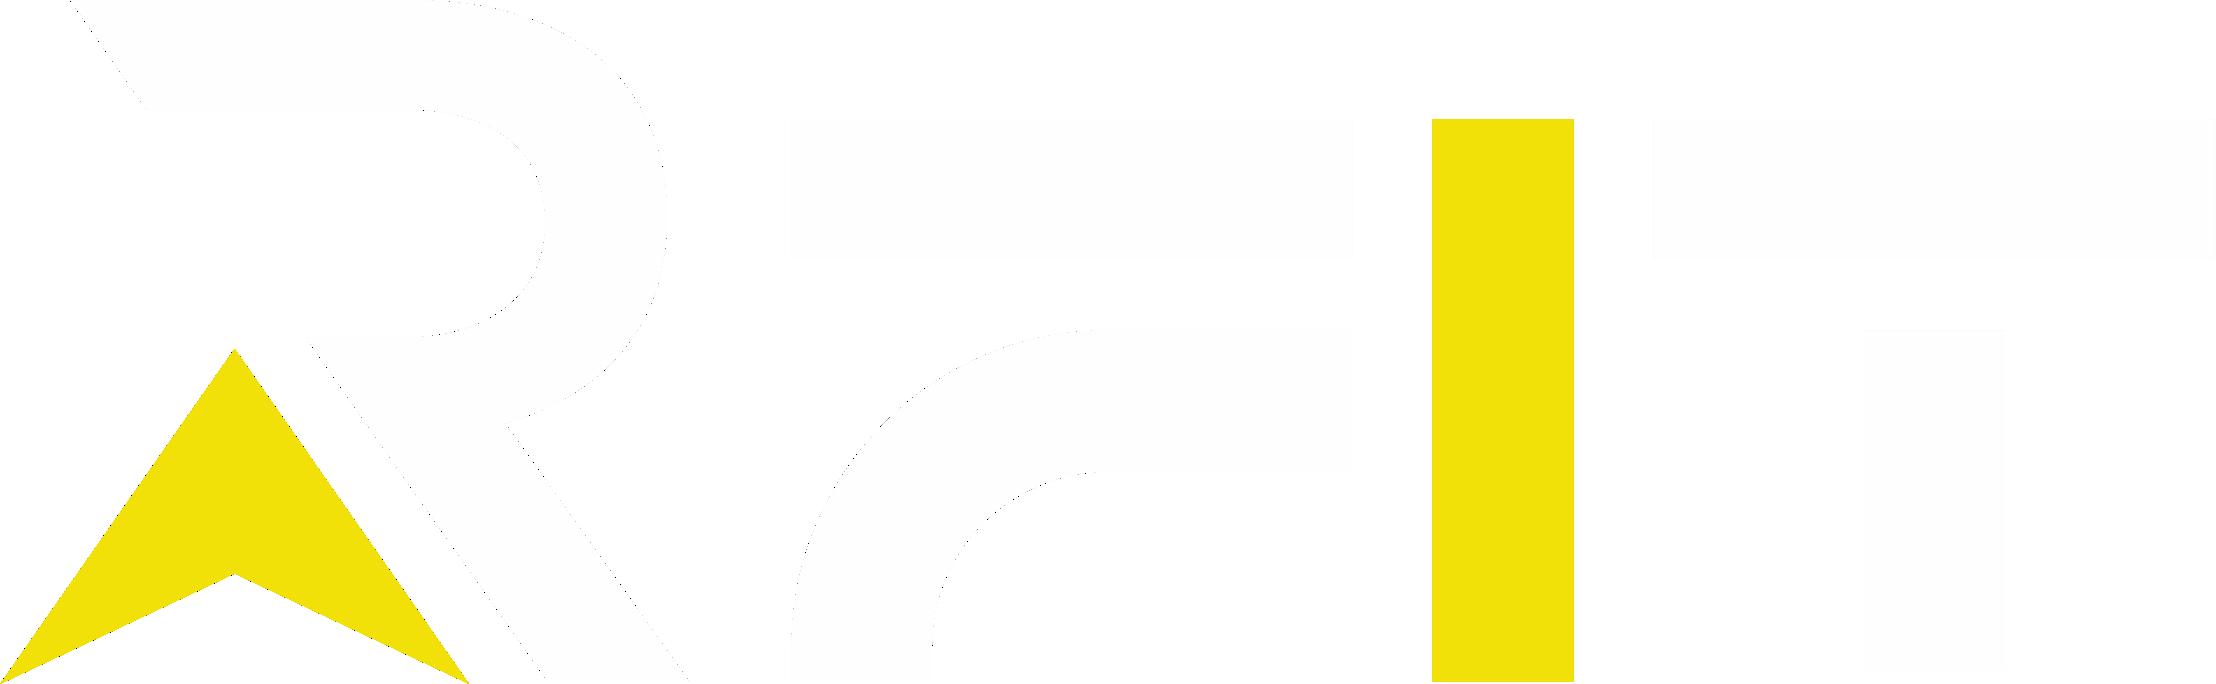 RFit Pro